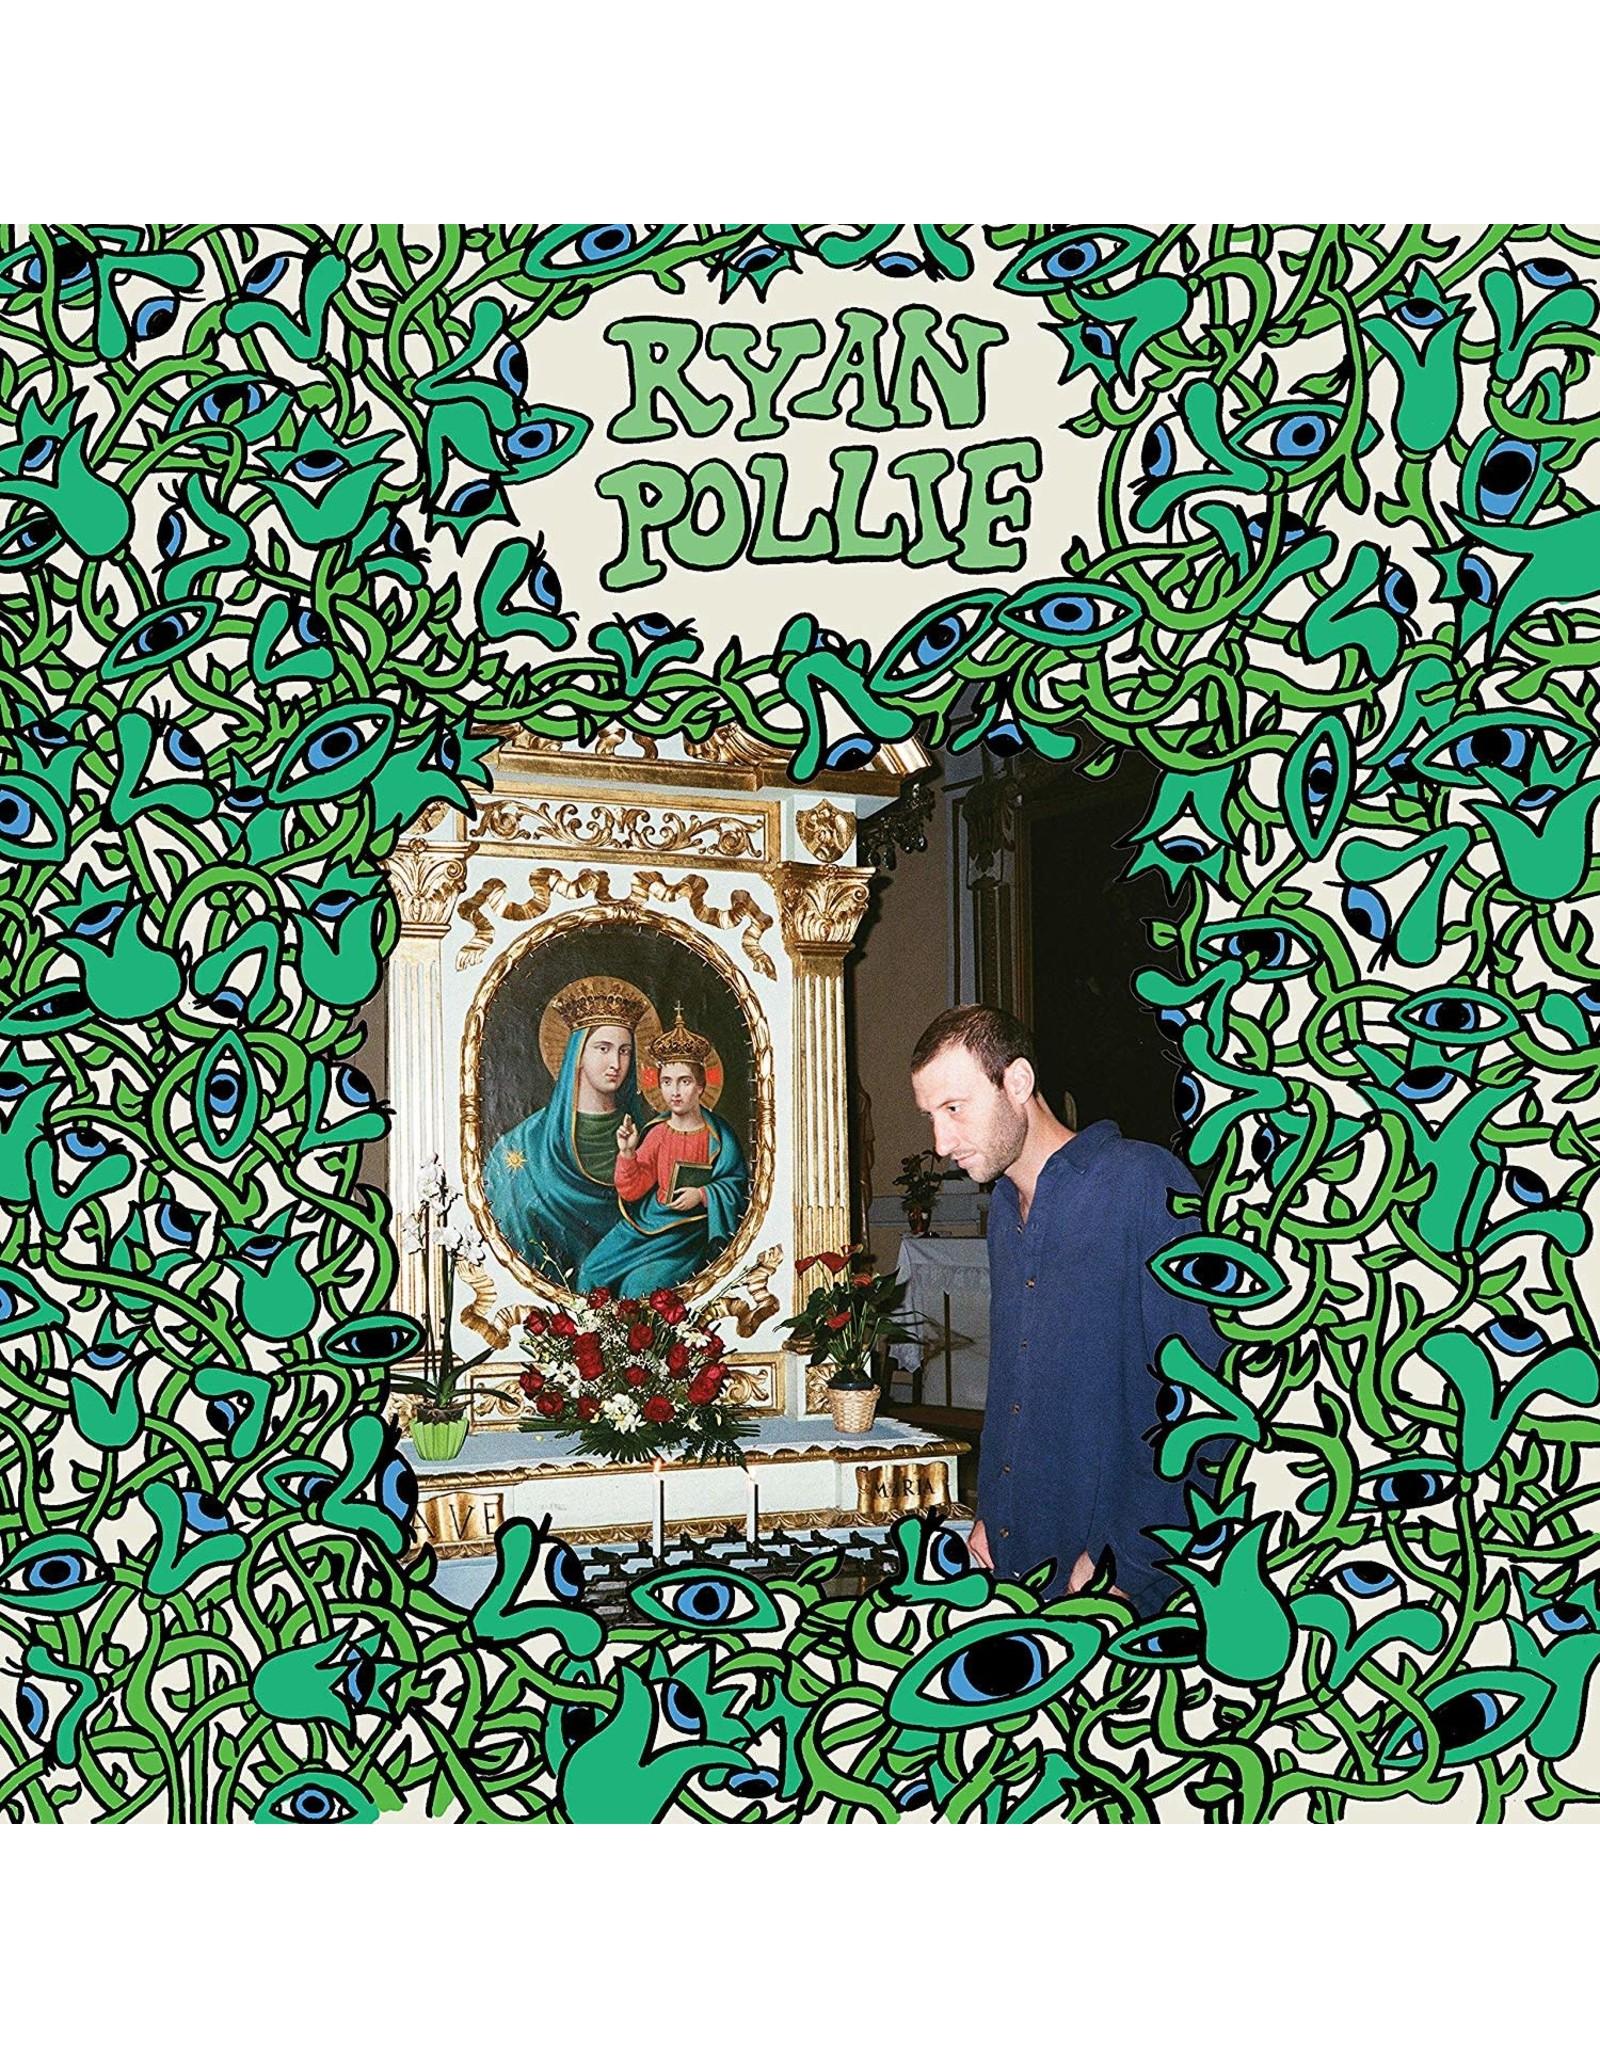 Pollie, Ryan - Ryan Pollie LP